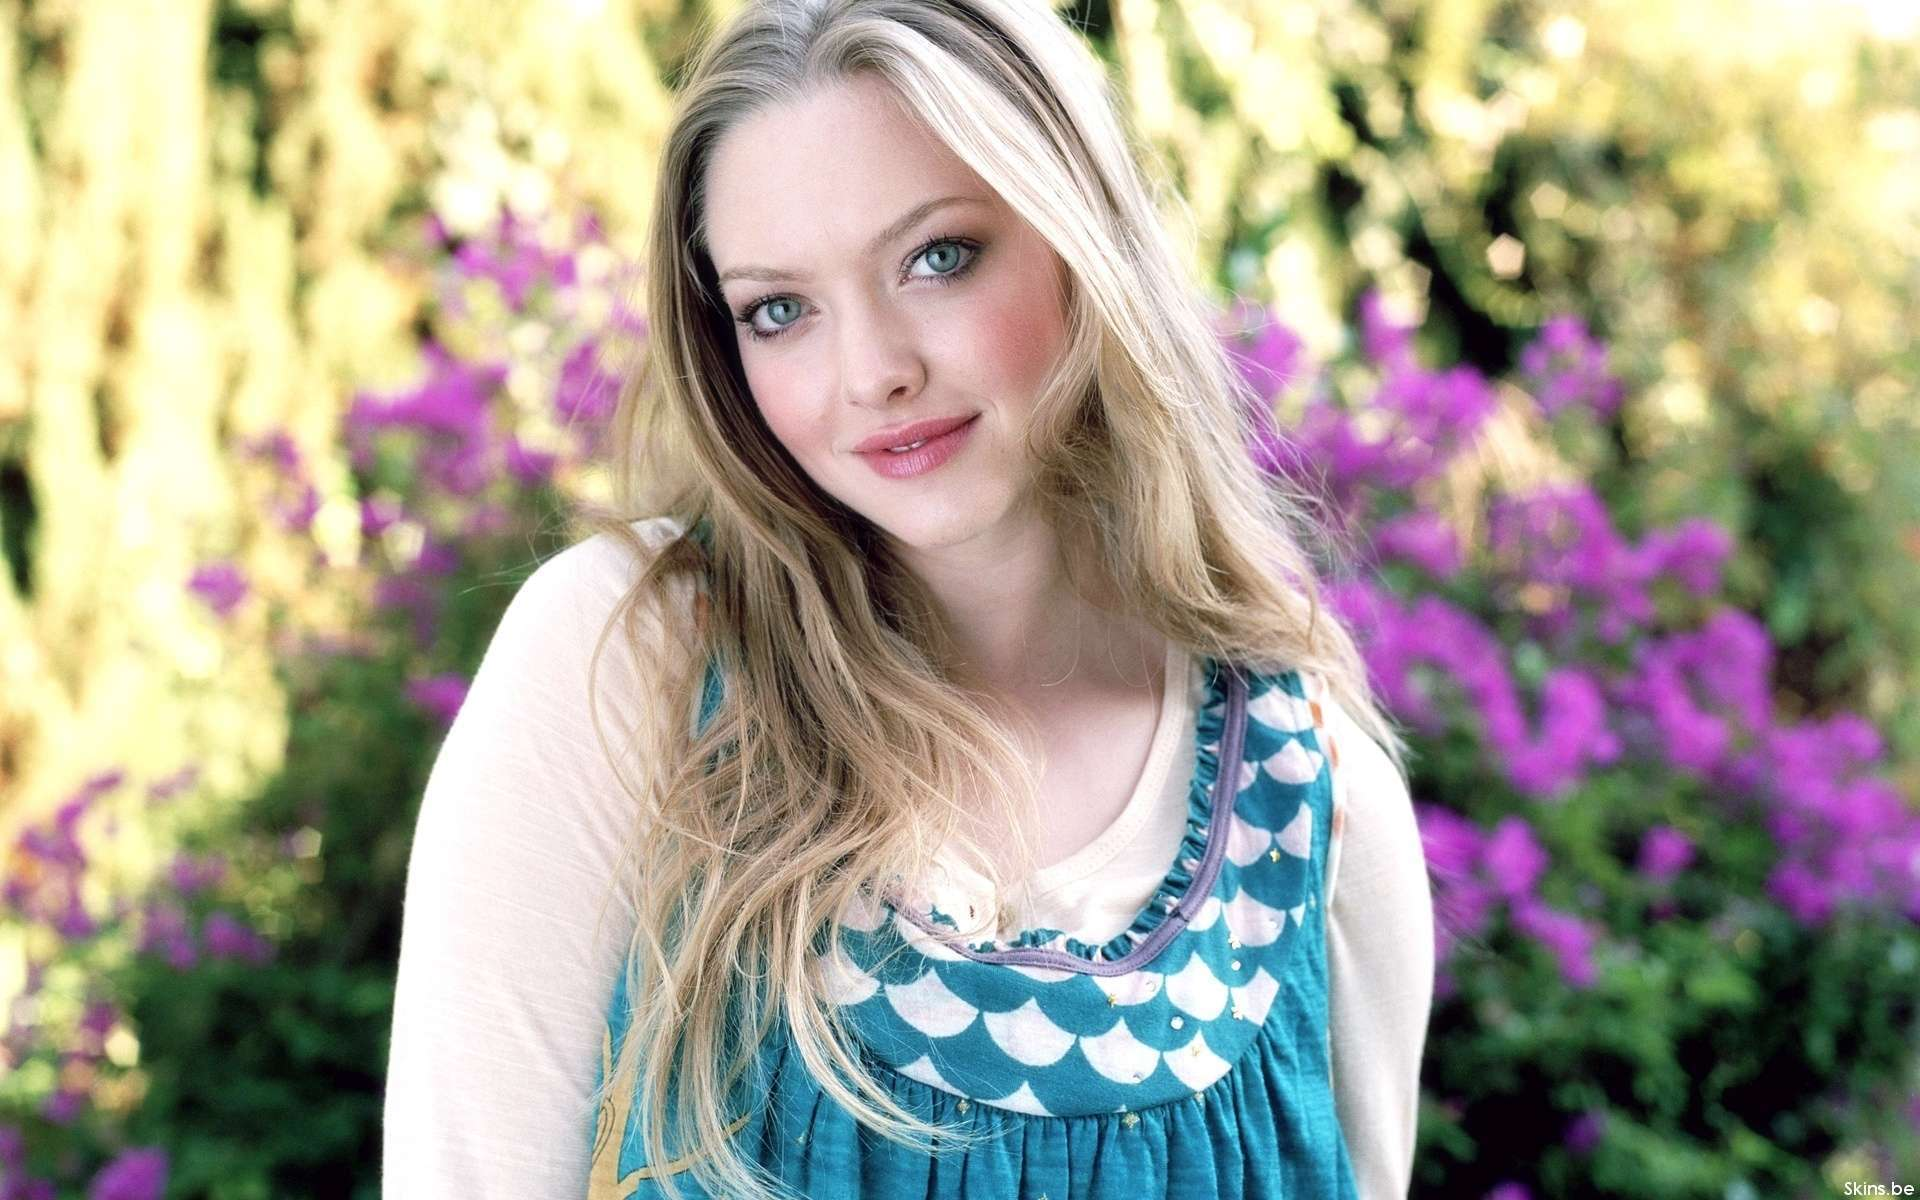 Amanda Seifred Hot